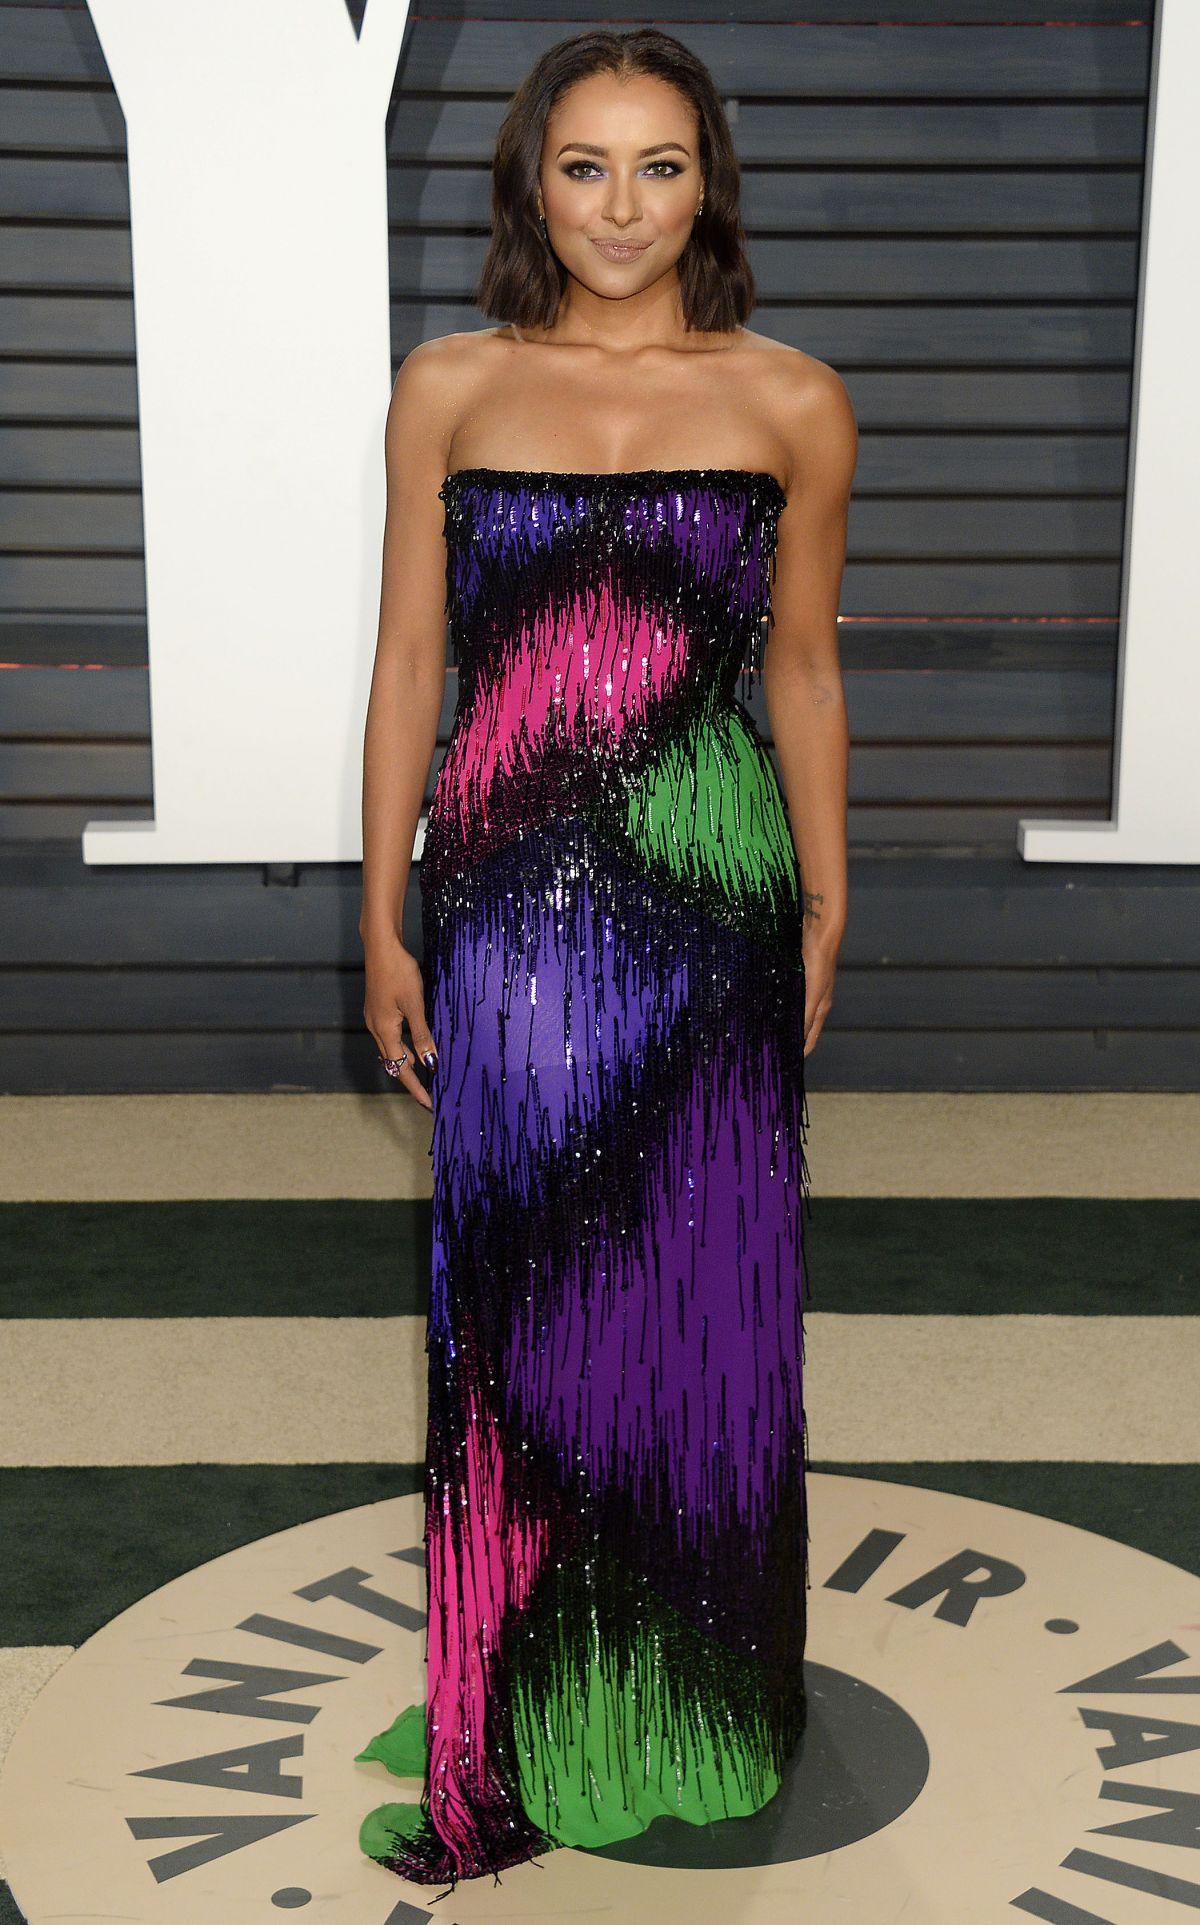 KAT GRAHAM at 2017 Vanity Fair Oscar Party in Beverly ...